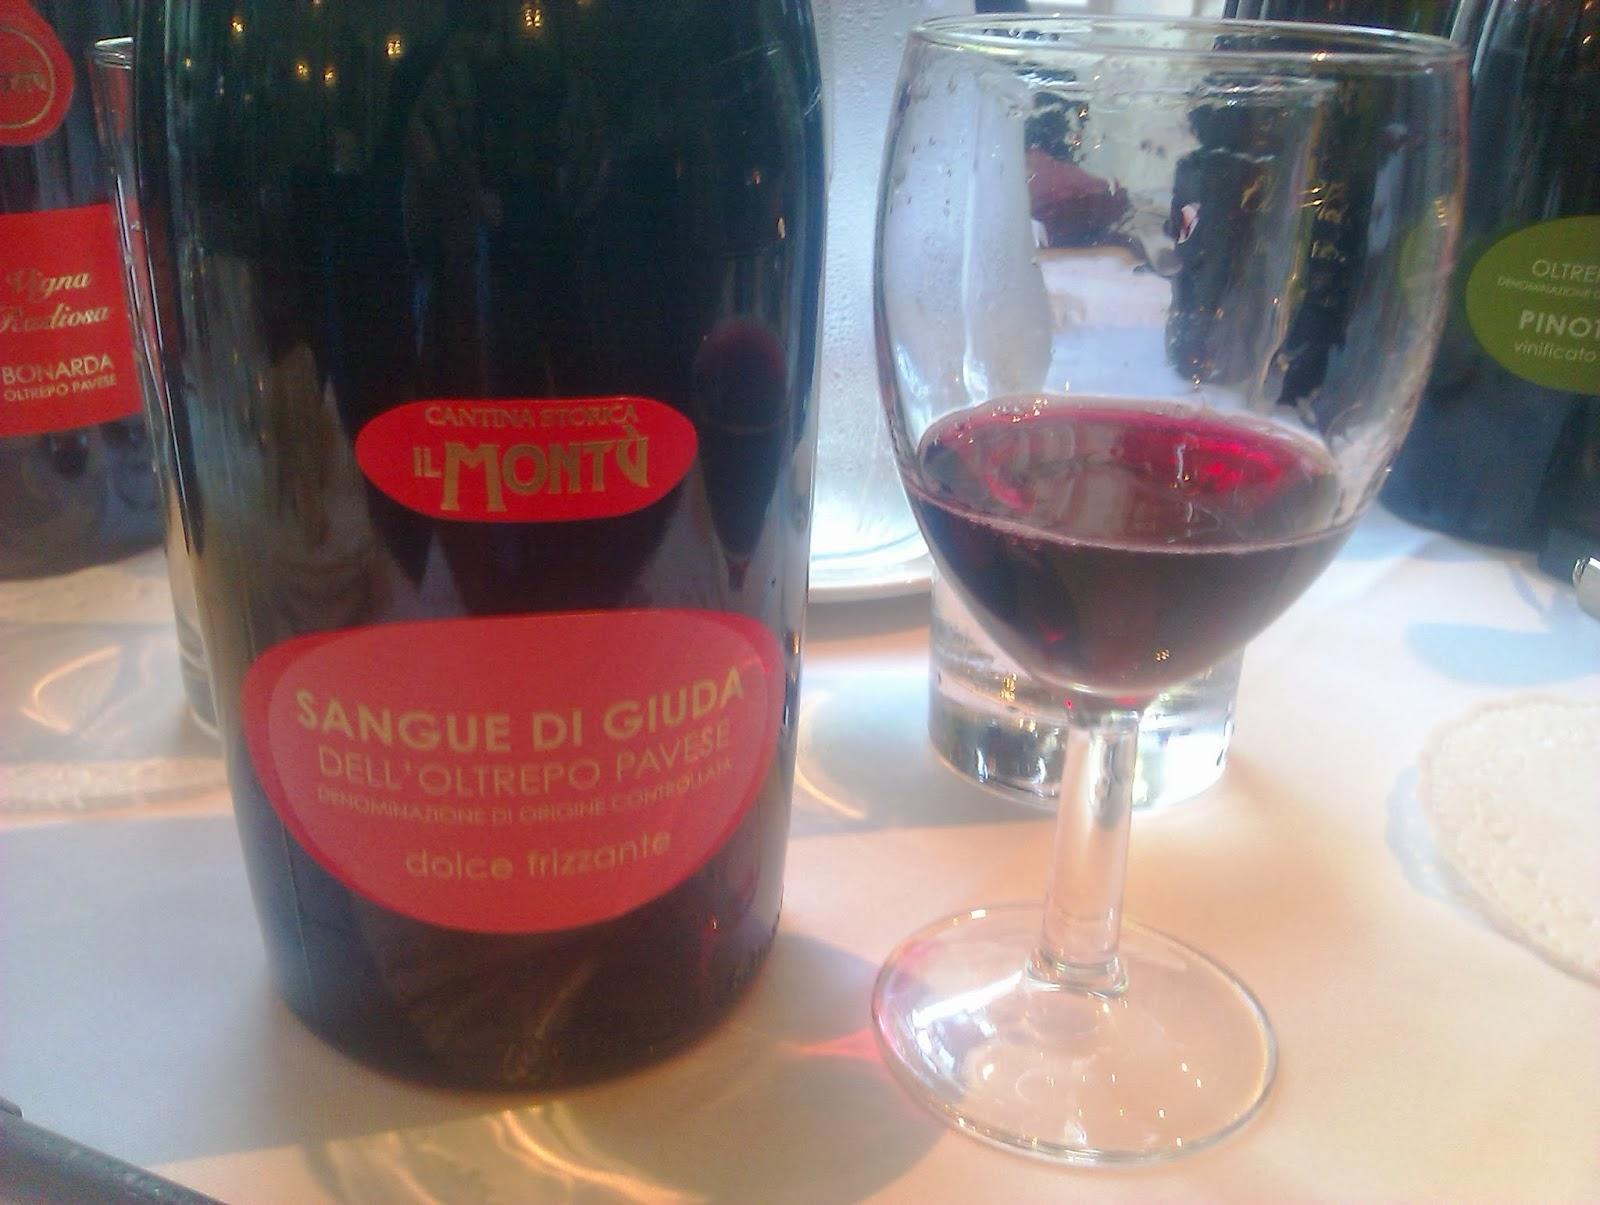 Wine Spice Sangue Di Giuda Or Blood Of Judas